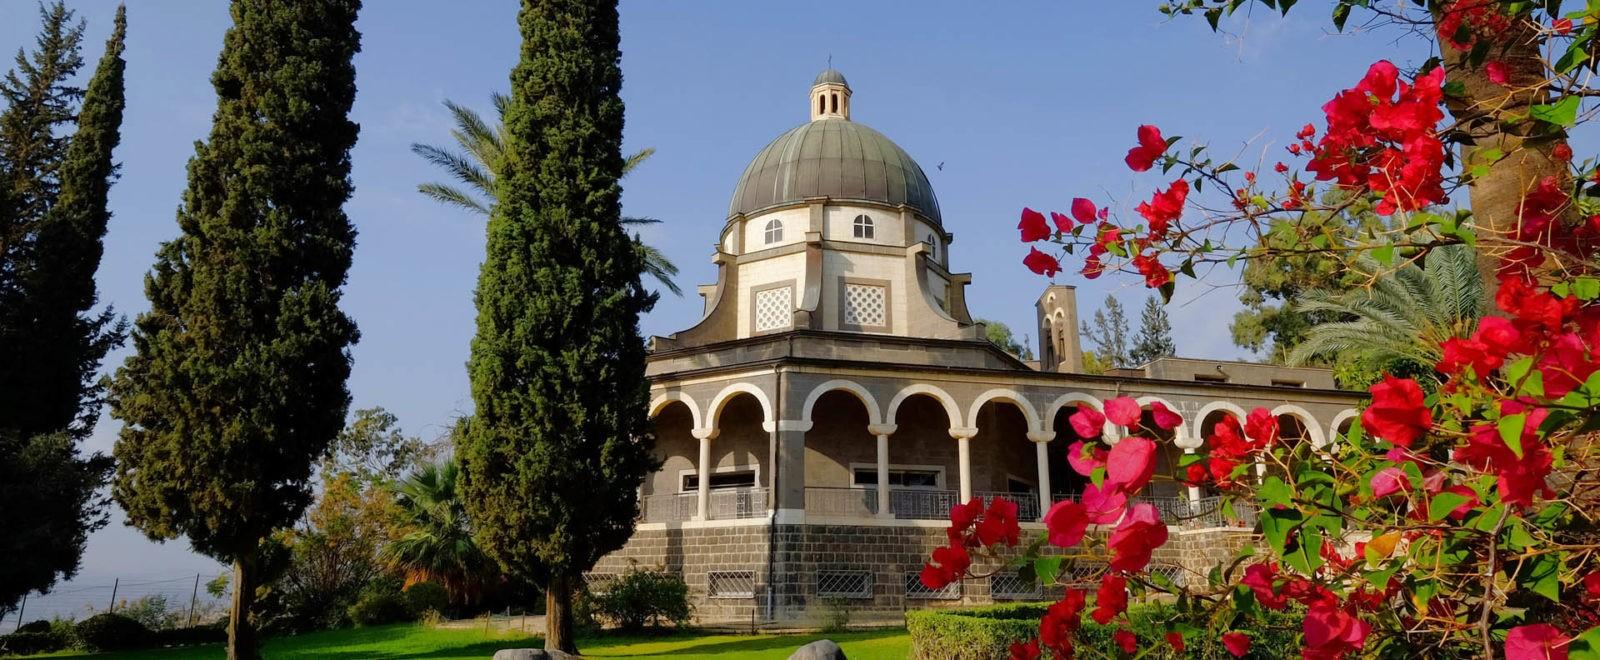 Visit Mount Beatitudes and the Catholic Chapel